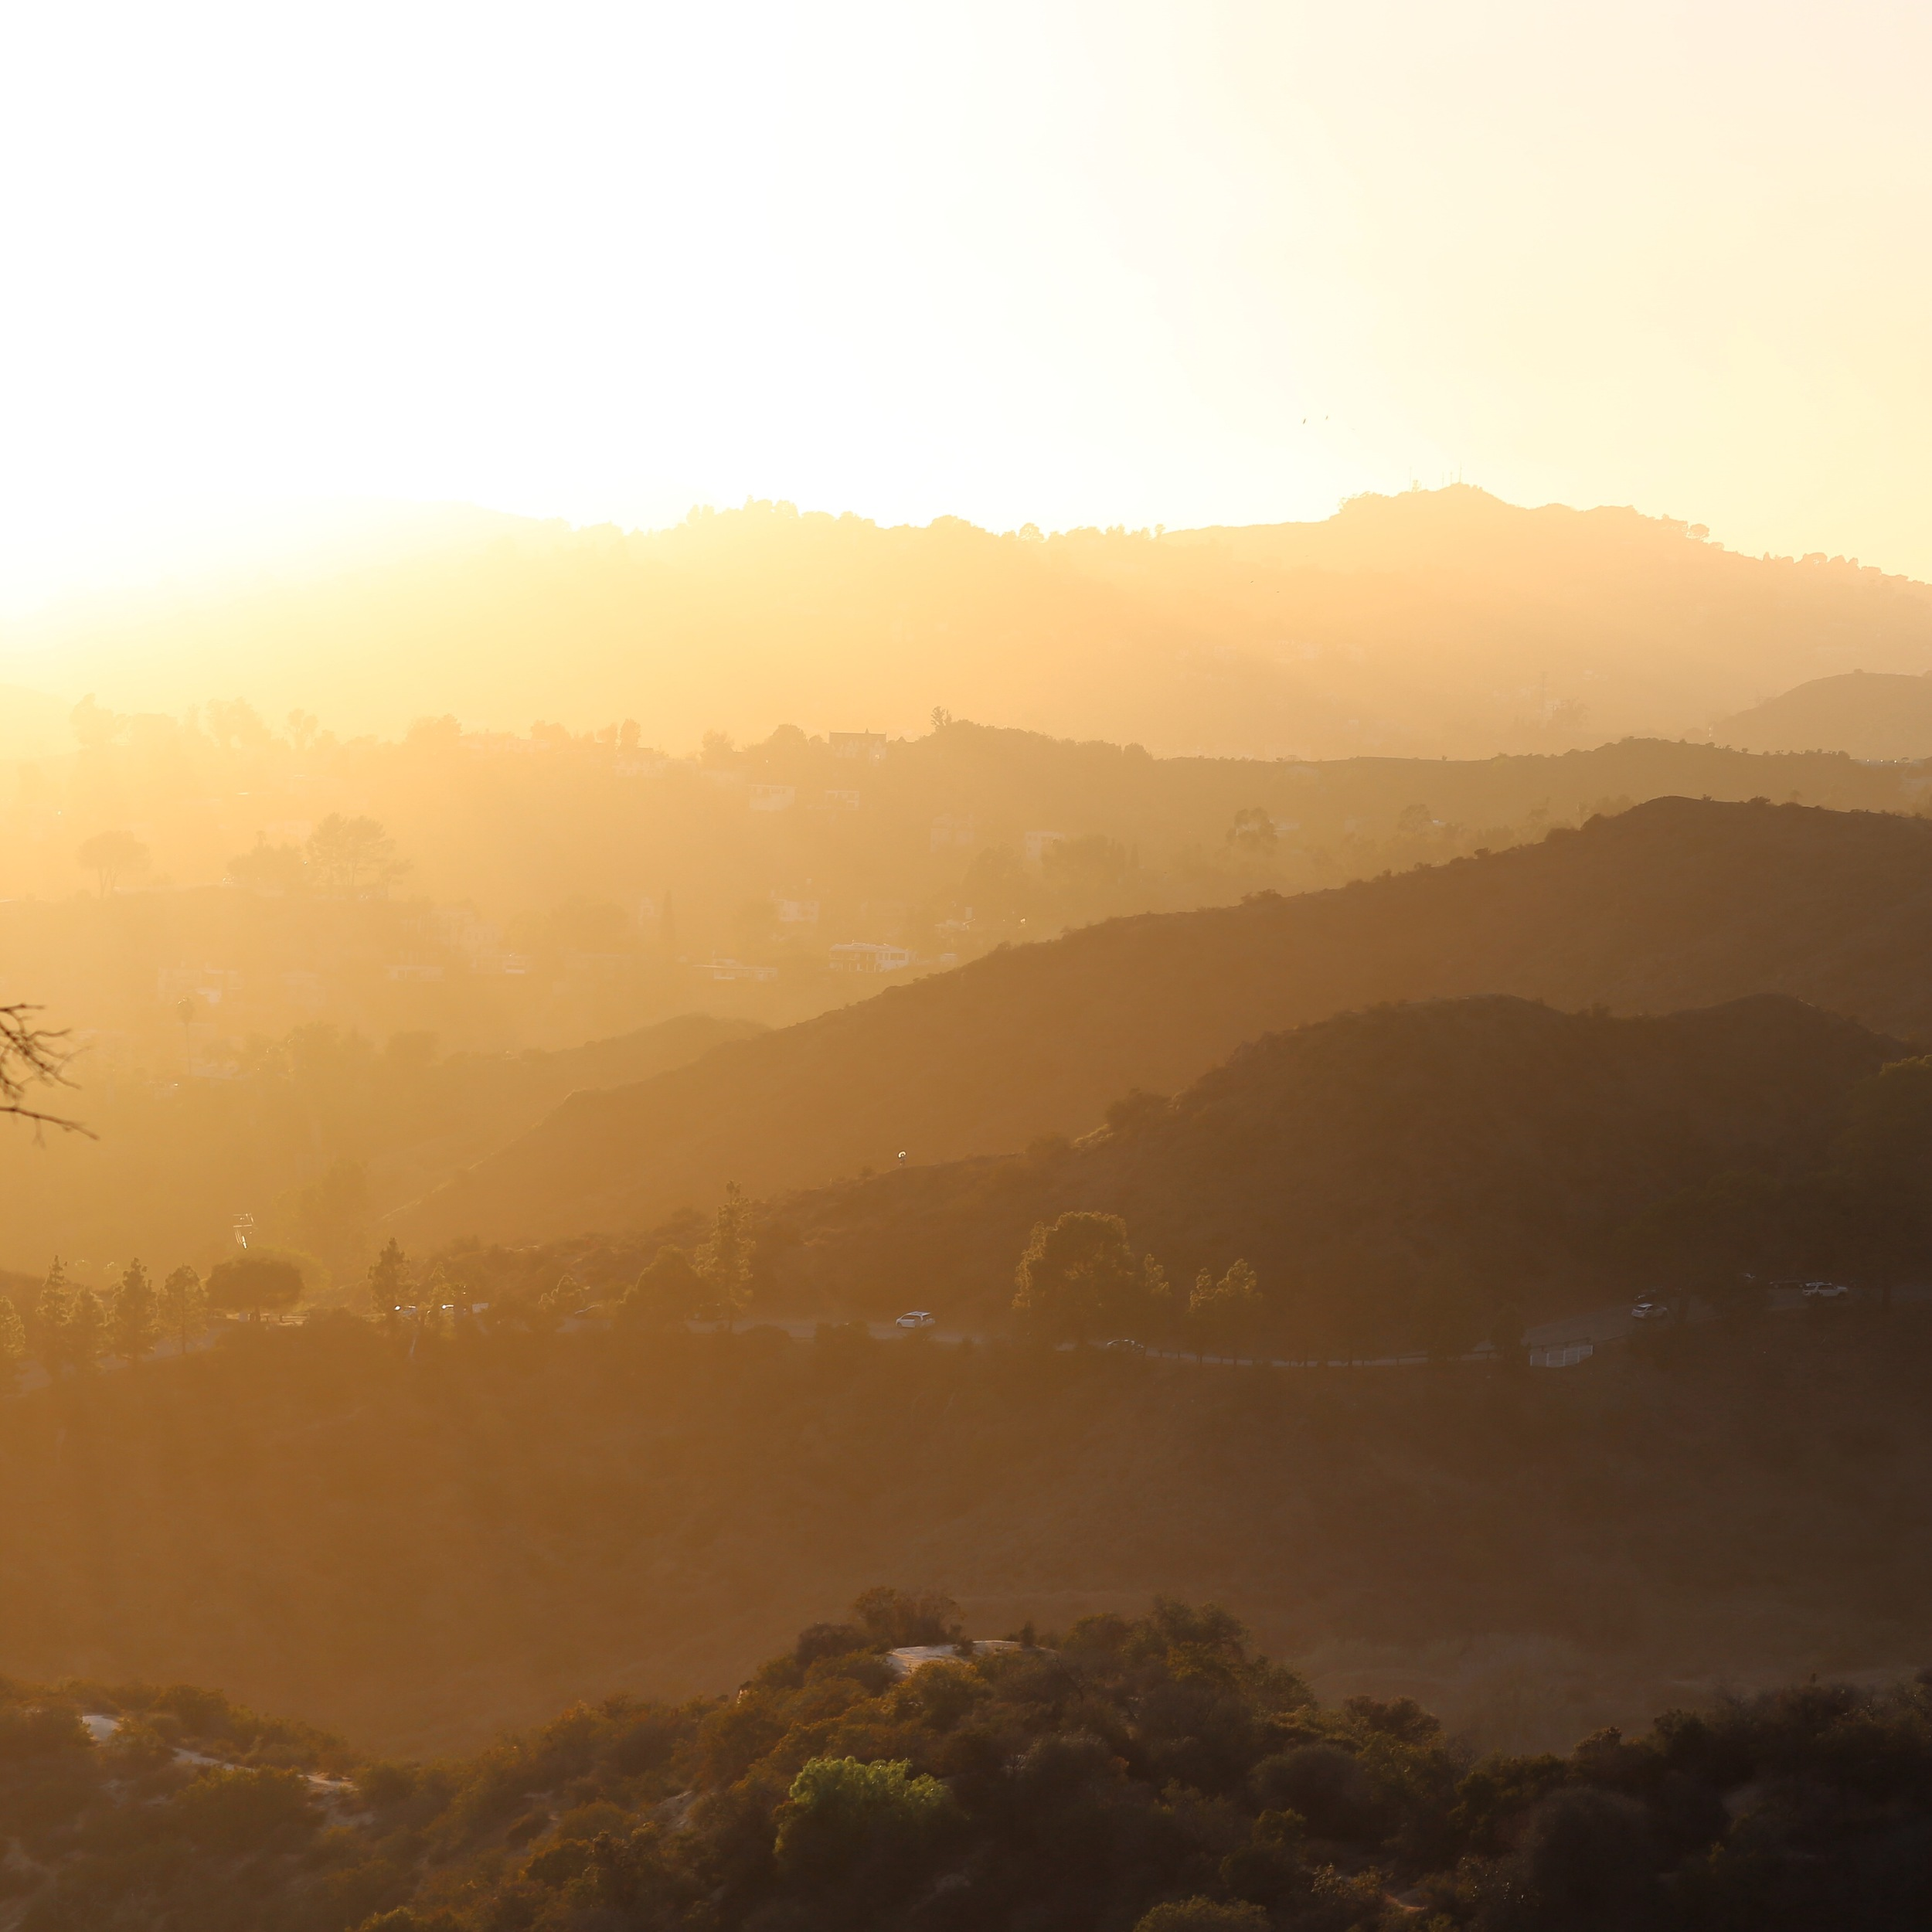 Hollywood Hills at Sunset